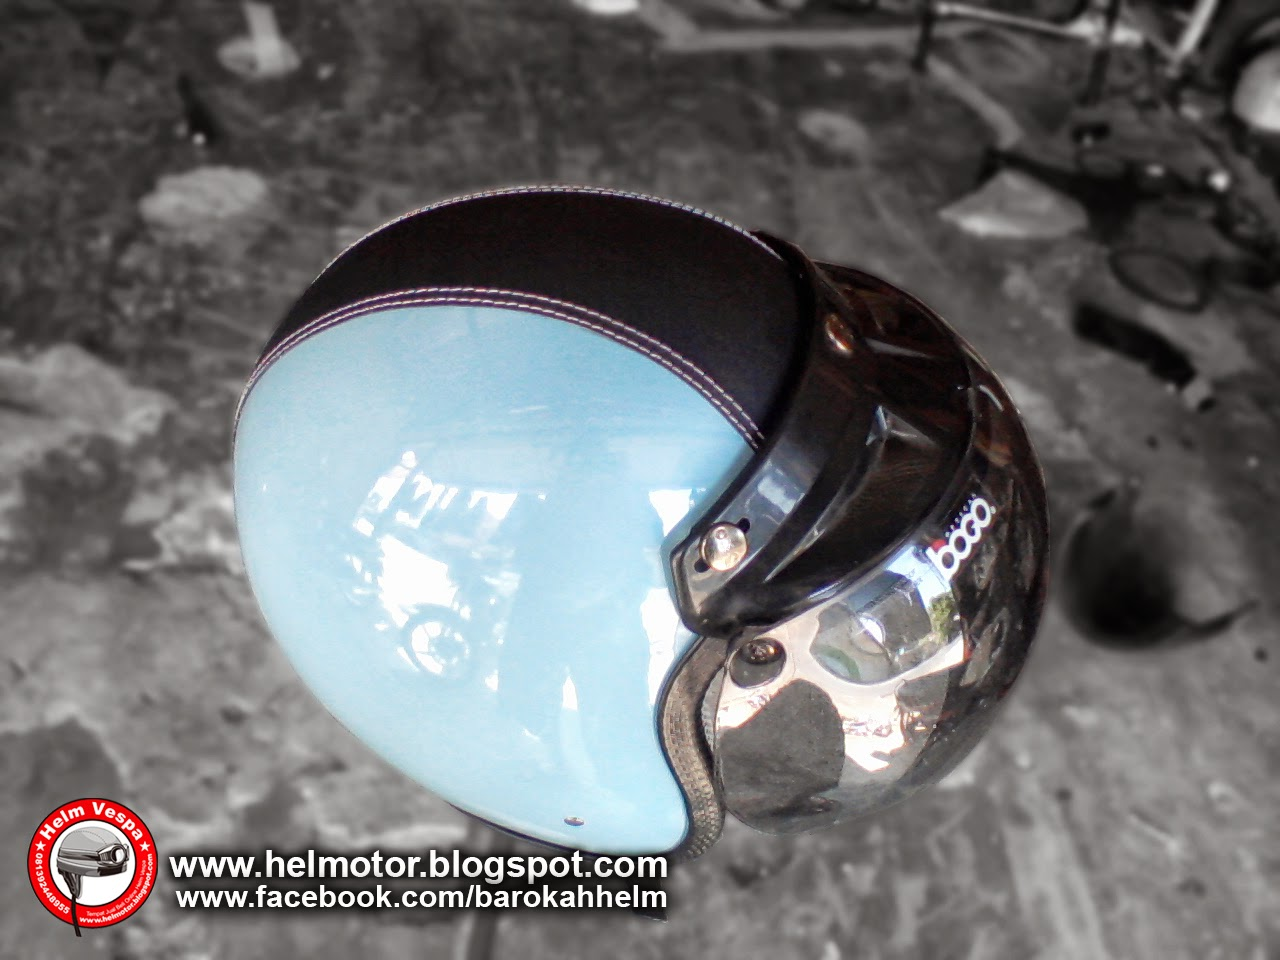 Helm Vespa Bogo Avatar Biru Muda  Helm Vespa